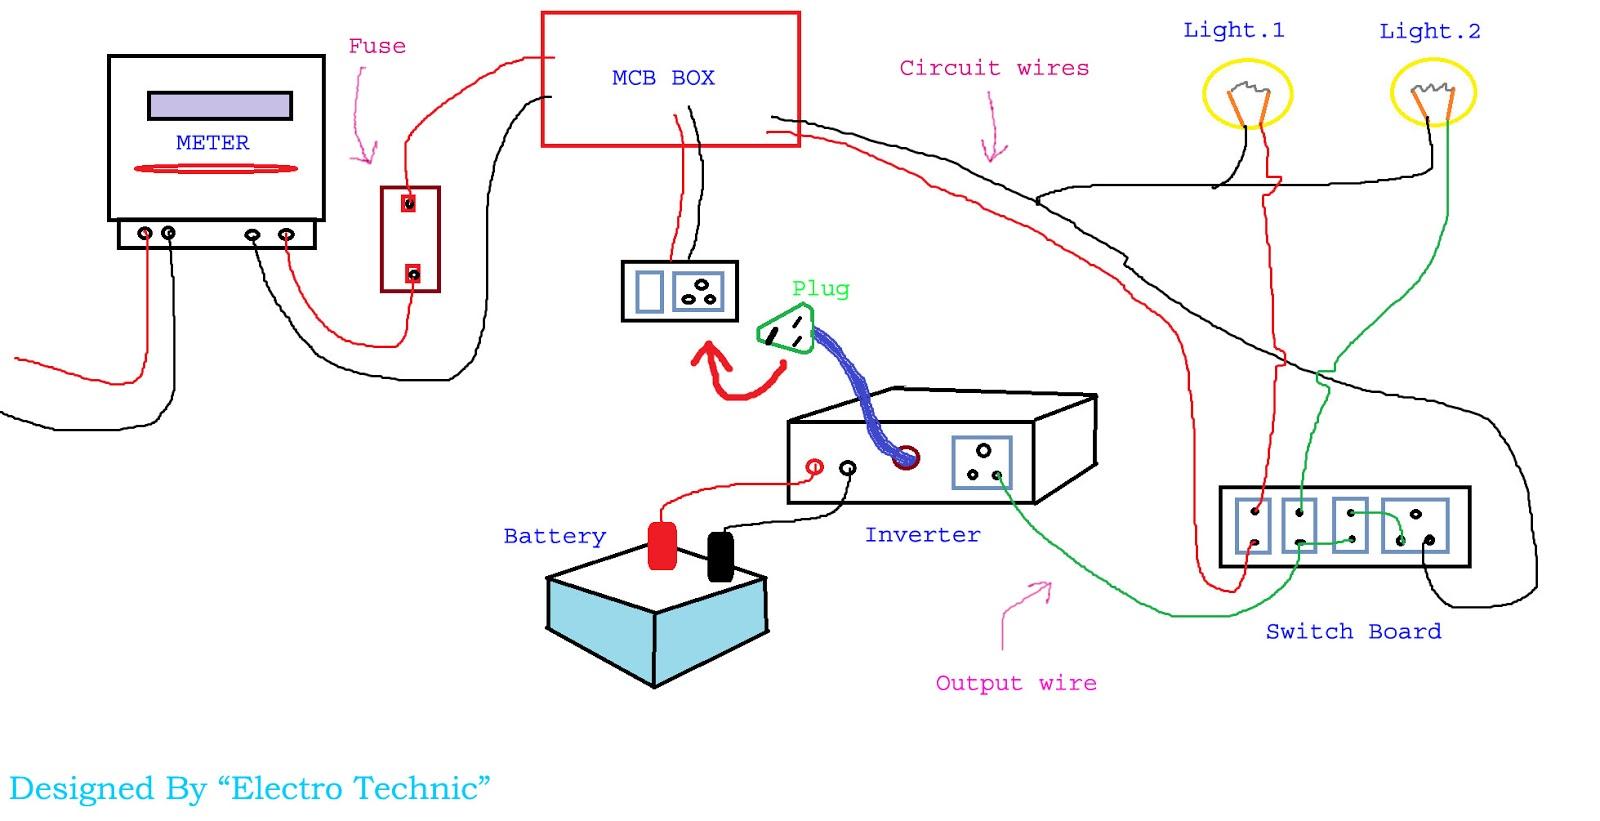 Inverter की प्रॉपर wiring connection हिंदी on